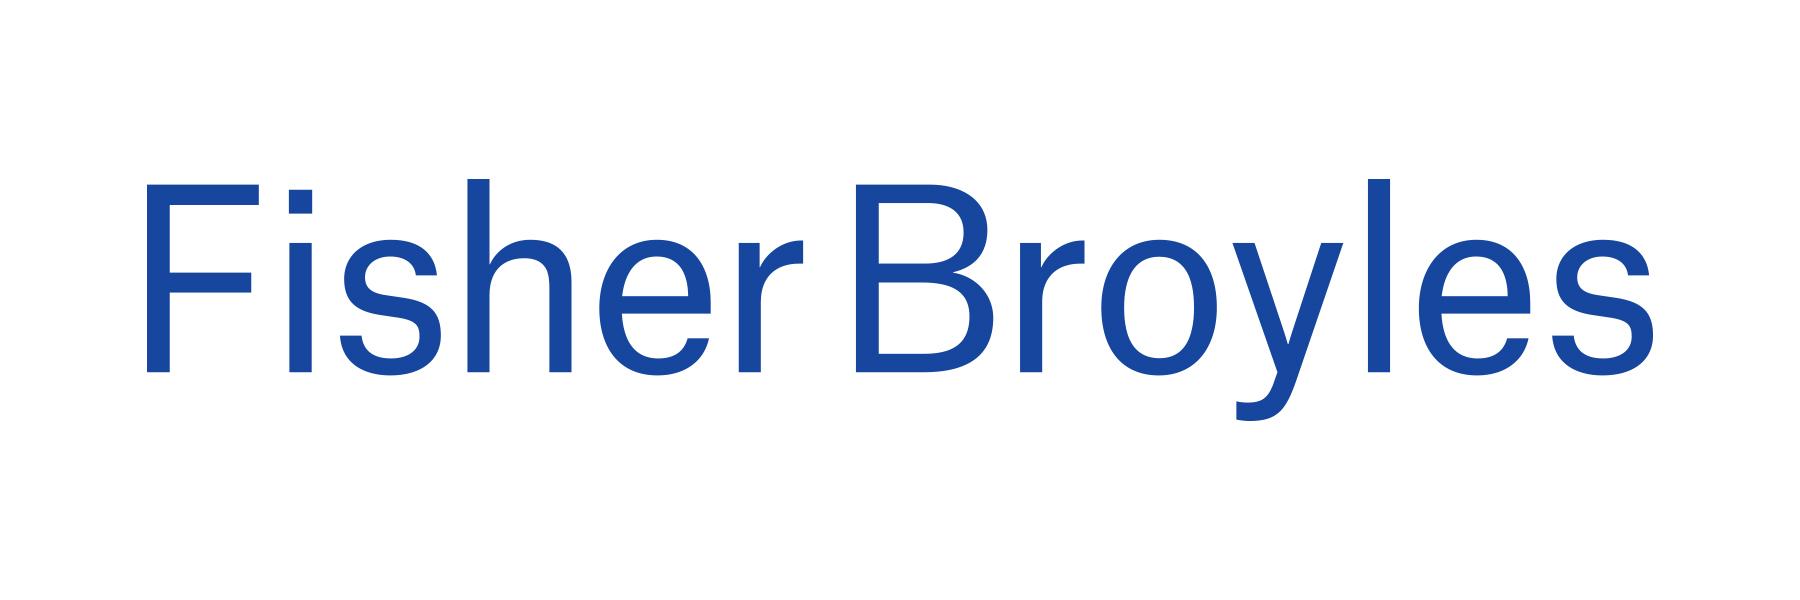 FisherBroyles, LLP Company Logo